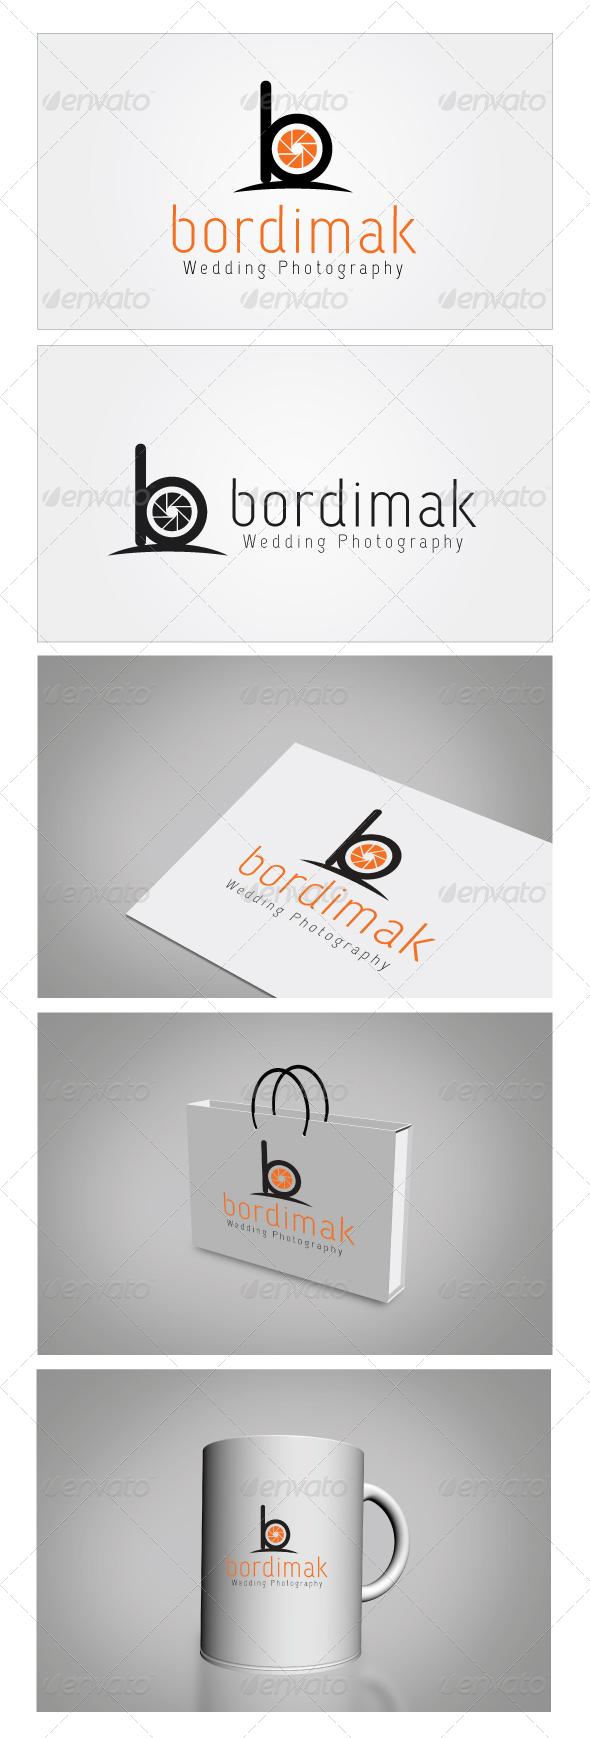 Bordimak Wedding Photography Logo Template